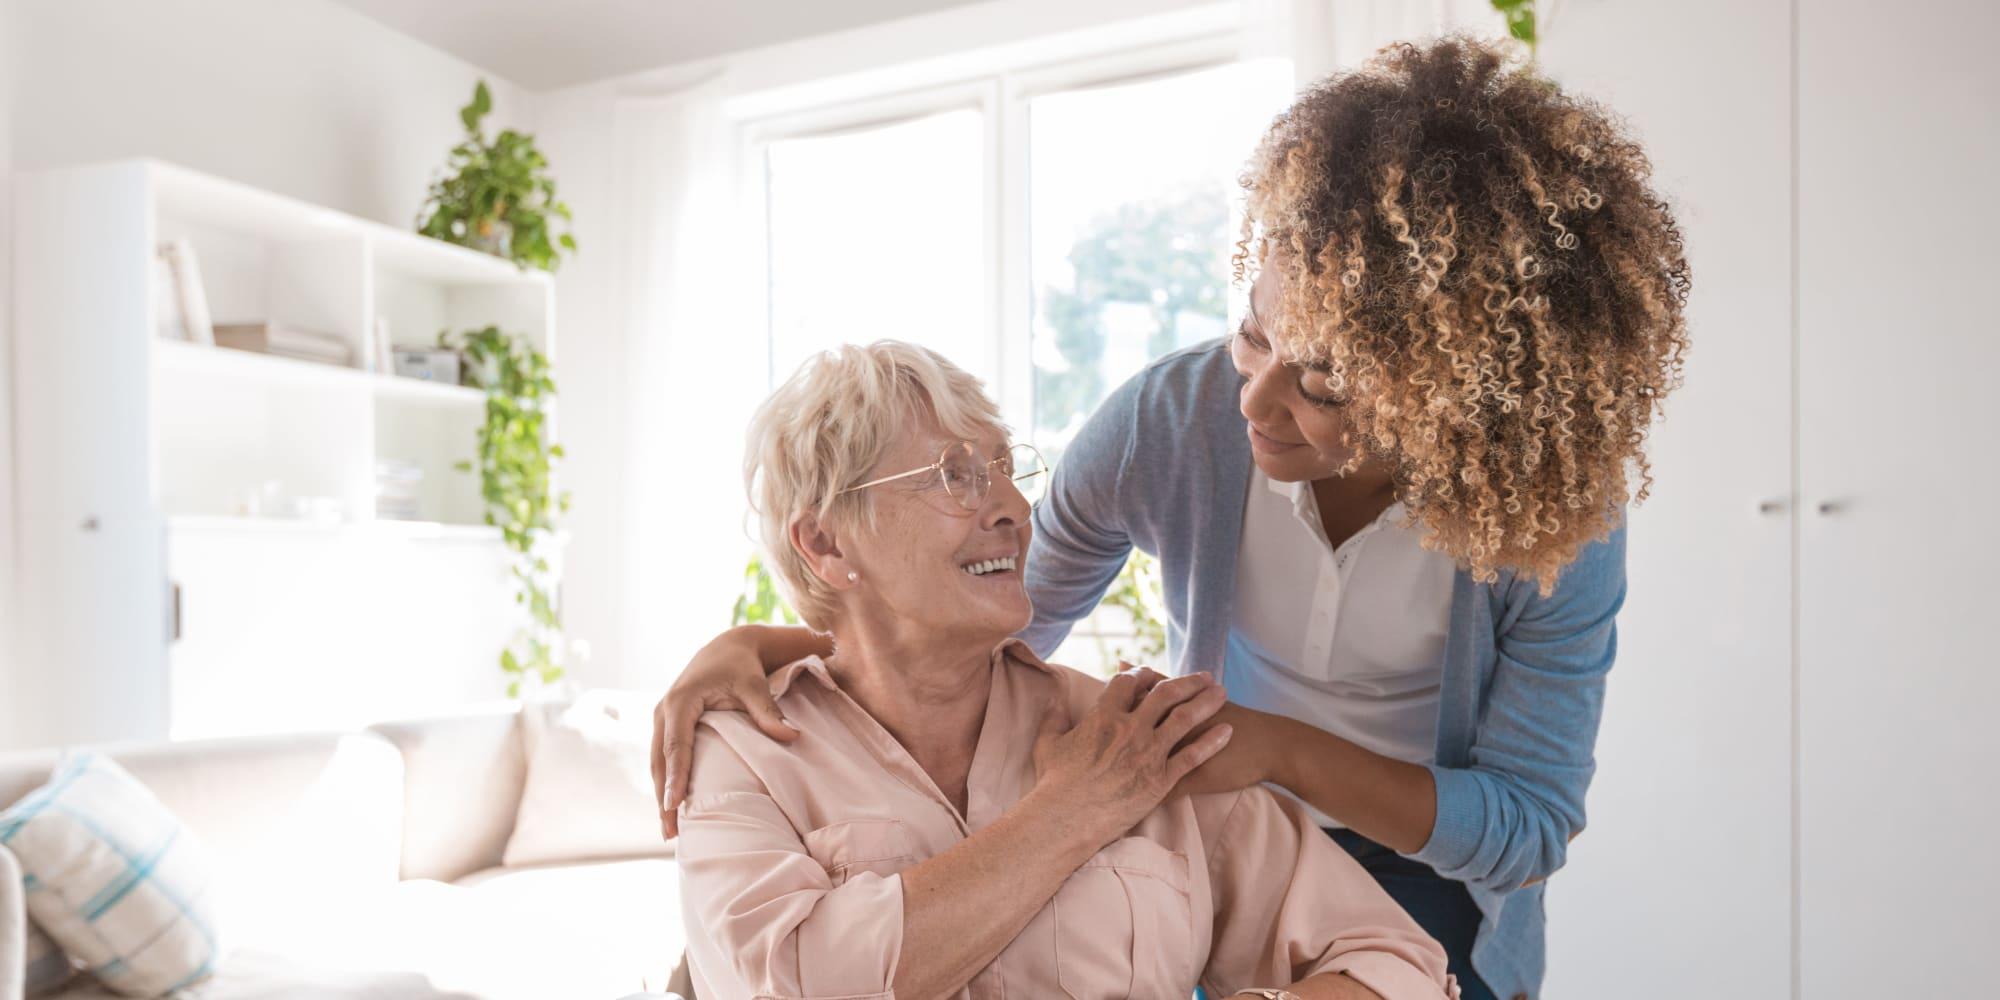 Aurora on France offers senior living in Edina, Minnesota